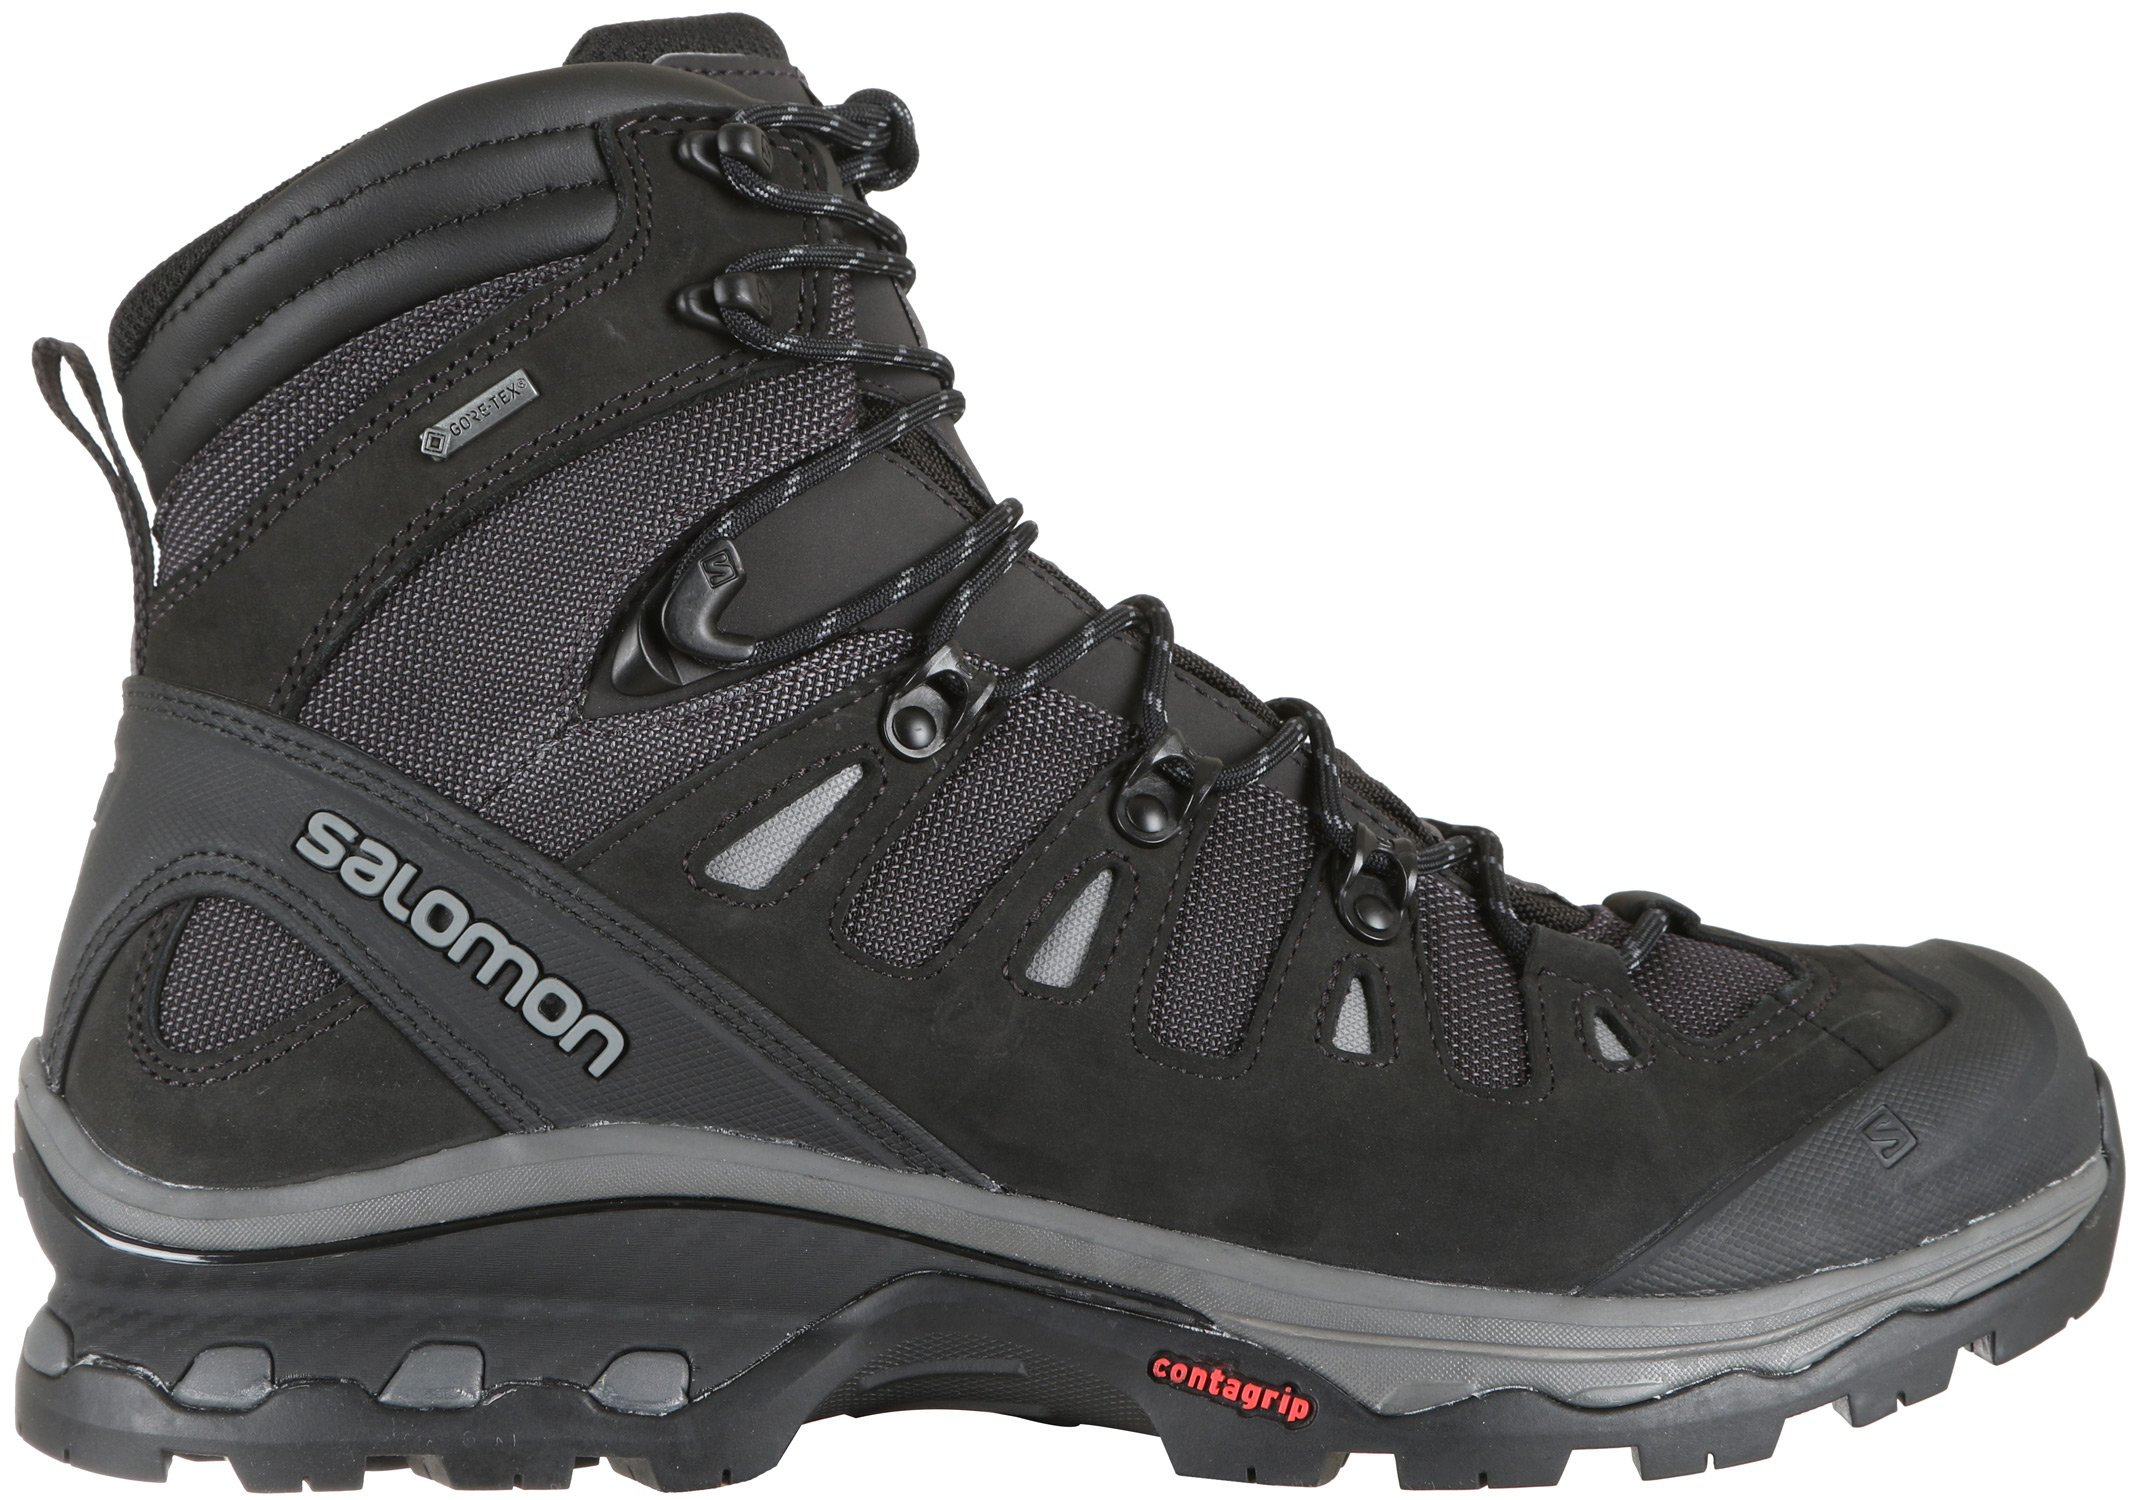 Quest 4d 3 GTX High Rise Hiking Boots